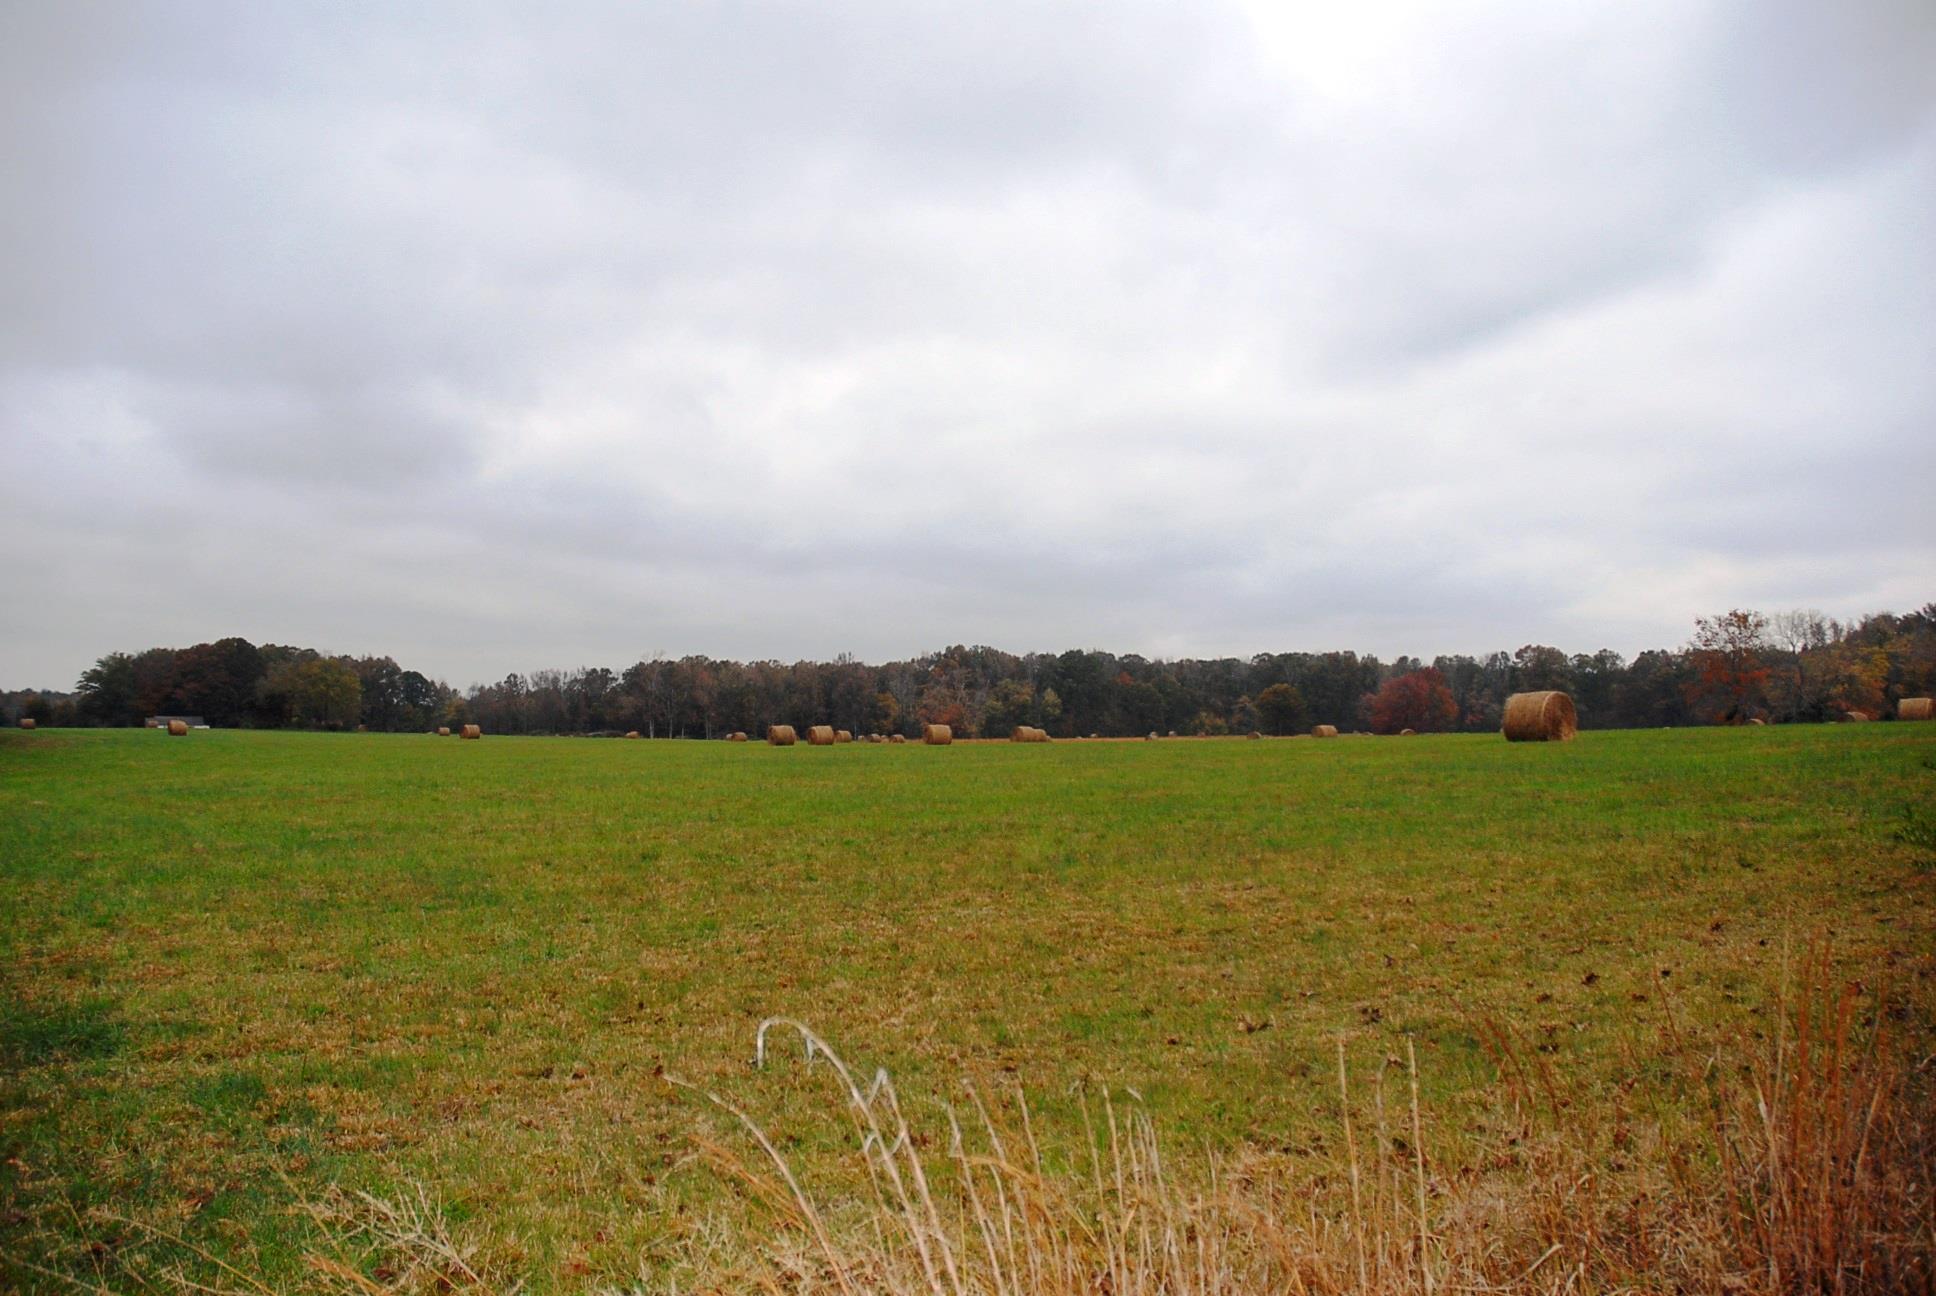 0 Ledford Mill Rd - 20.6 AC Property Photo - Tullahoma, TN real estate listing